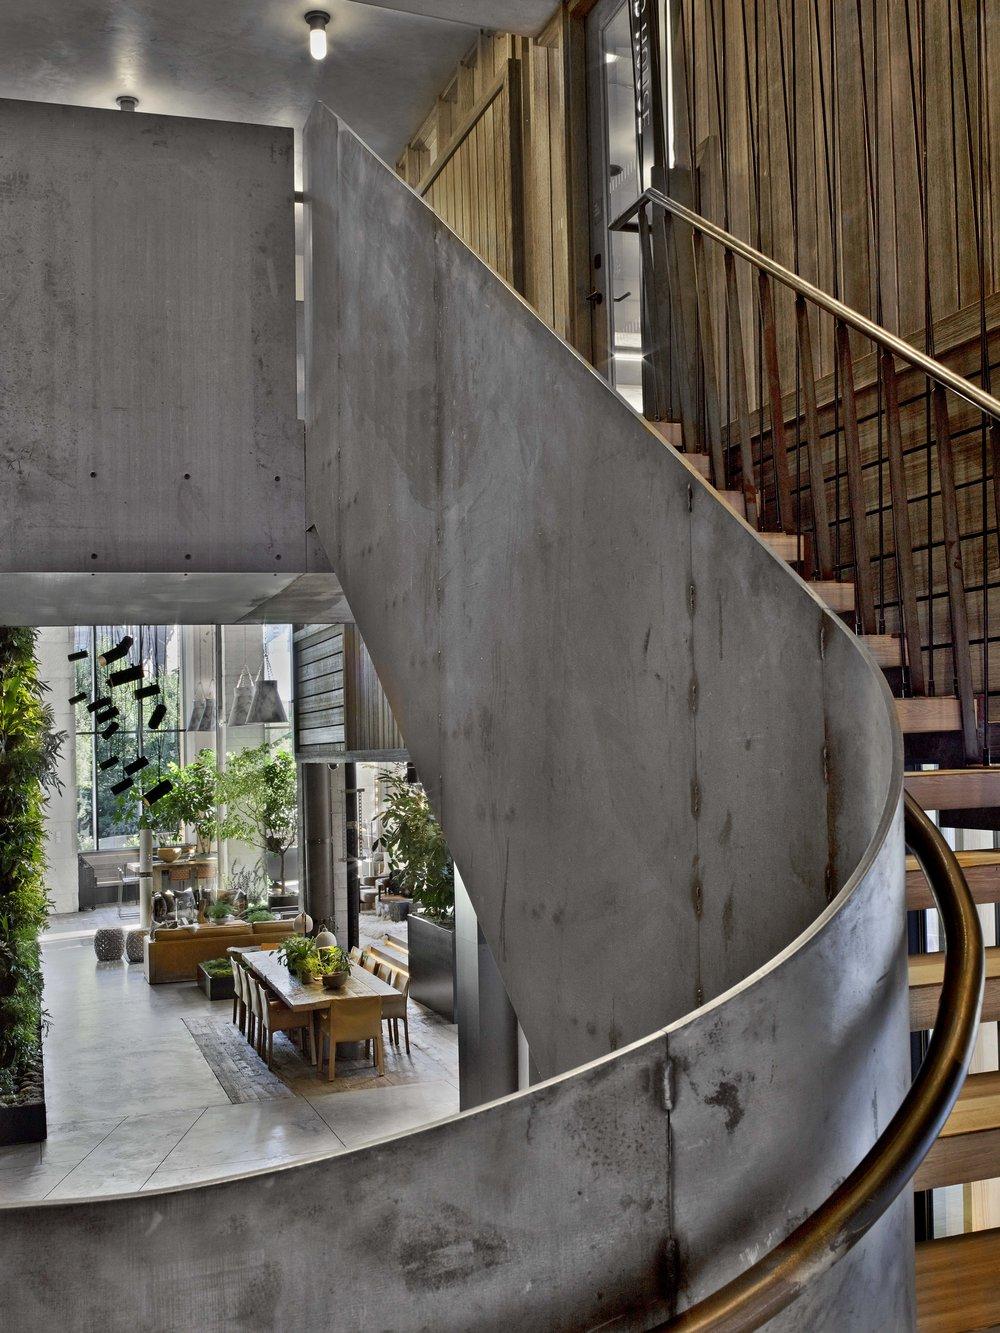 1 Hotel Brooklyn Bridge Stairs and Lobby